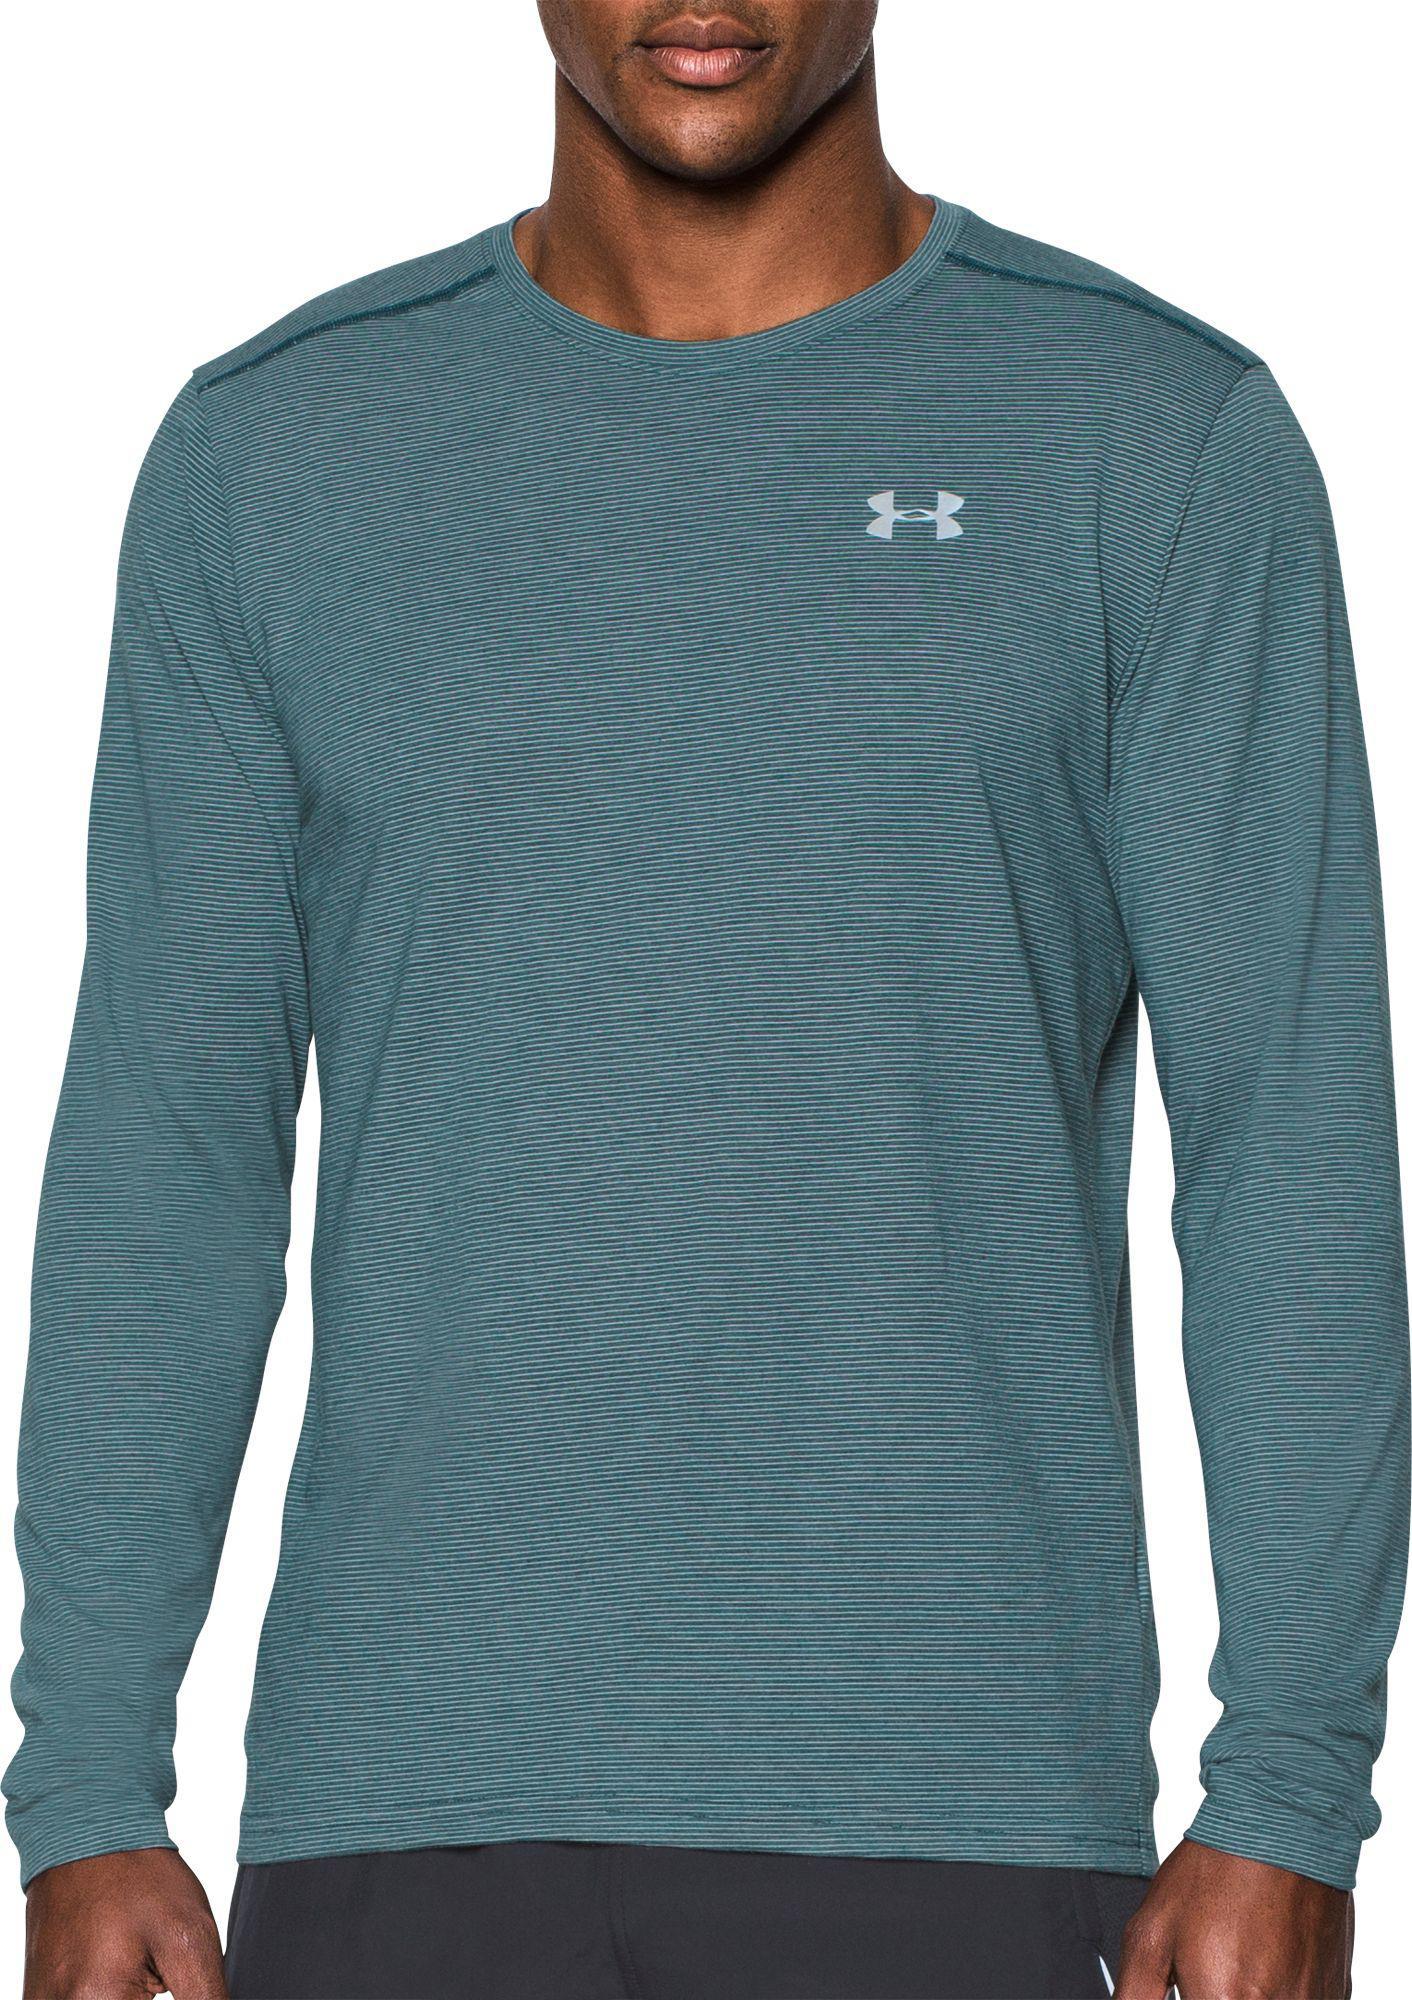 Shirts Under Armour Streaker 2.0 Half Zip Long Sleeve Mens Running Top Men's Clothing Black Soft And Antislippery